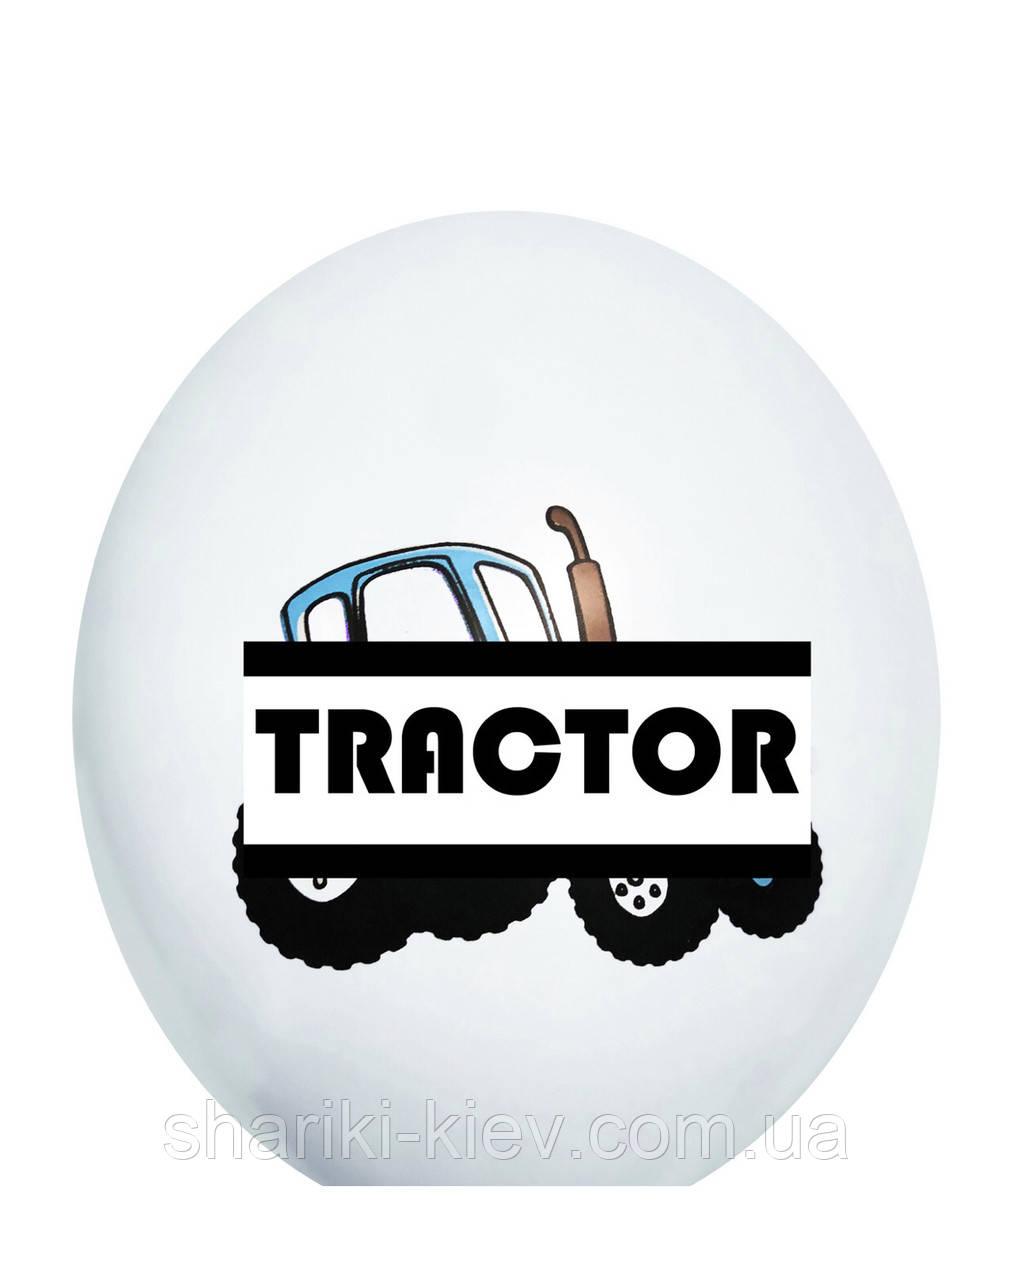 Гелиевый шарик Трактор